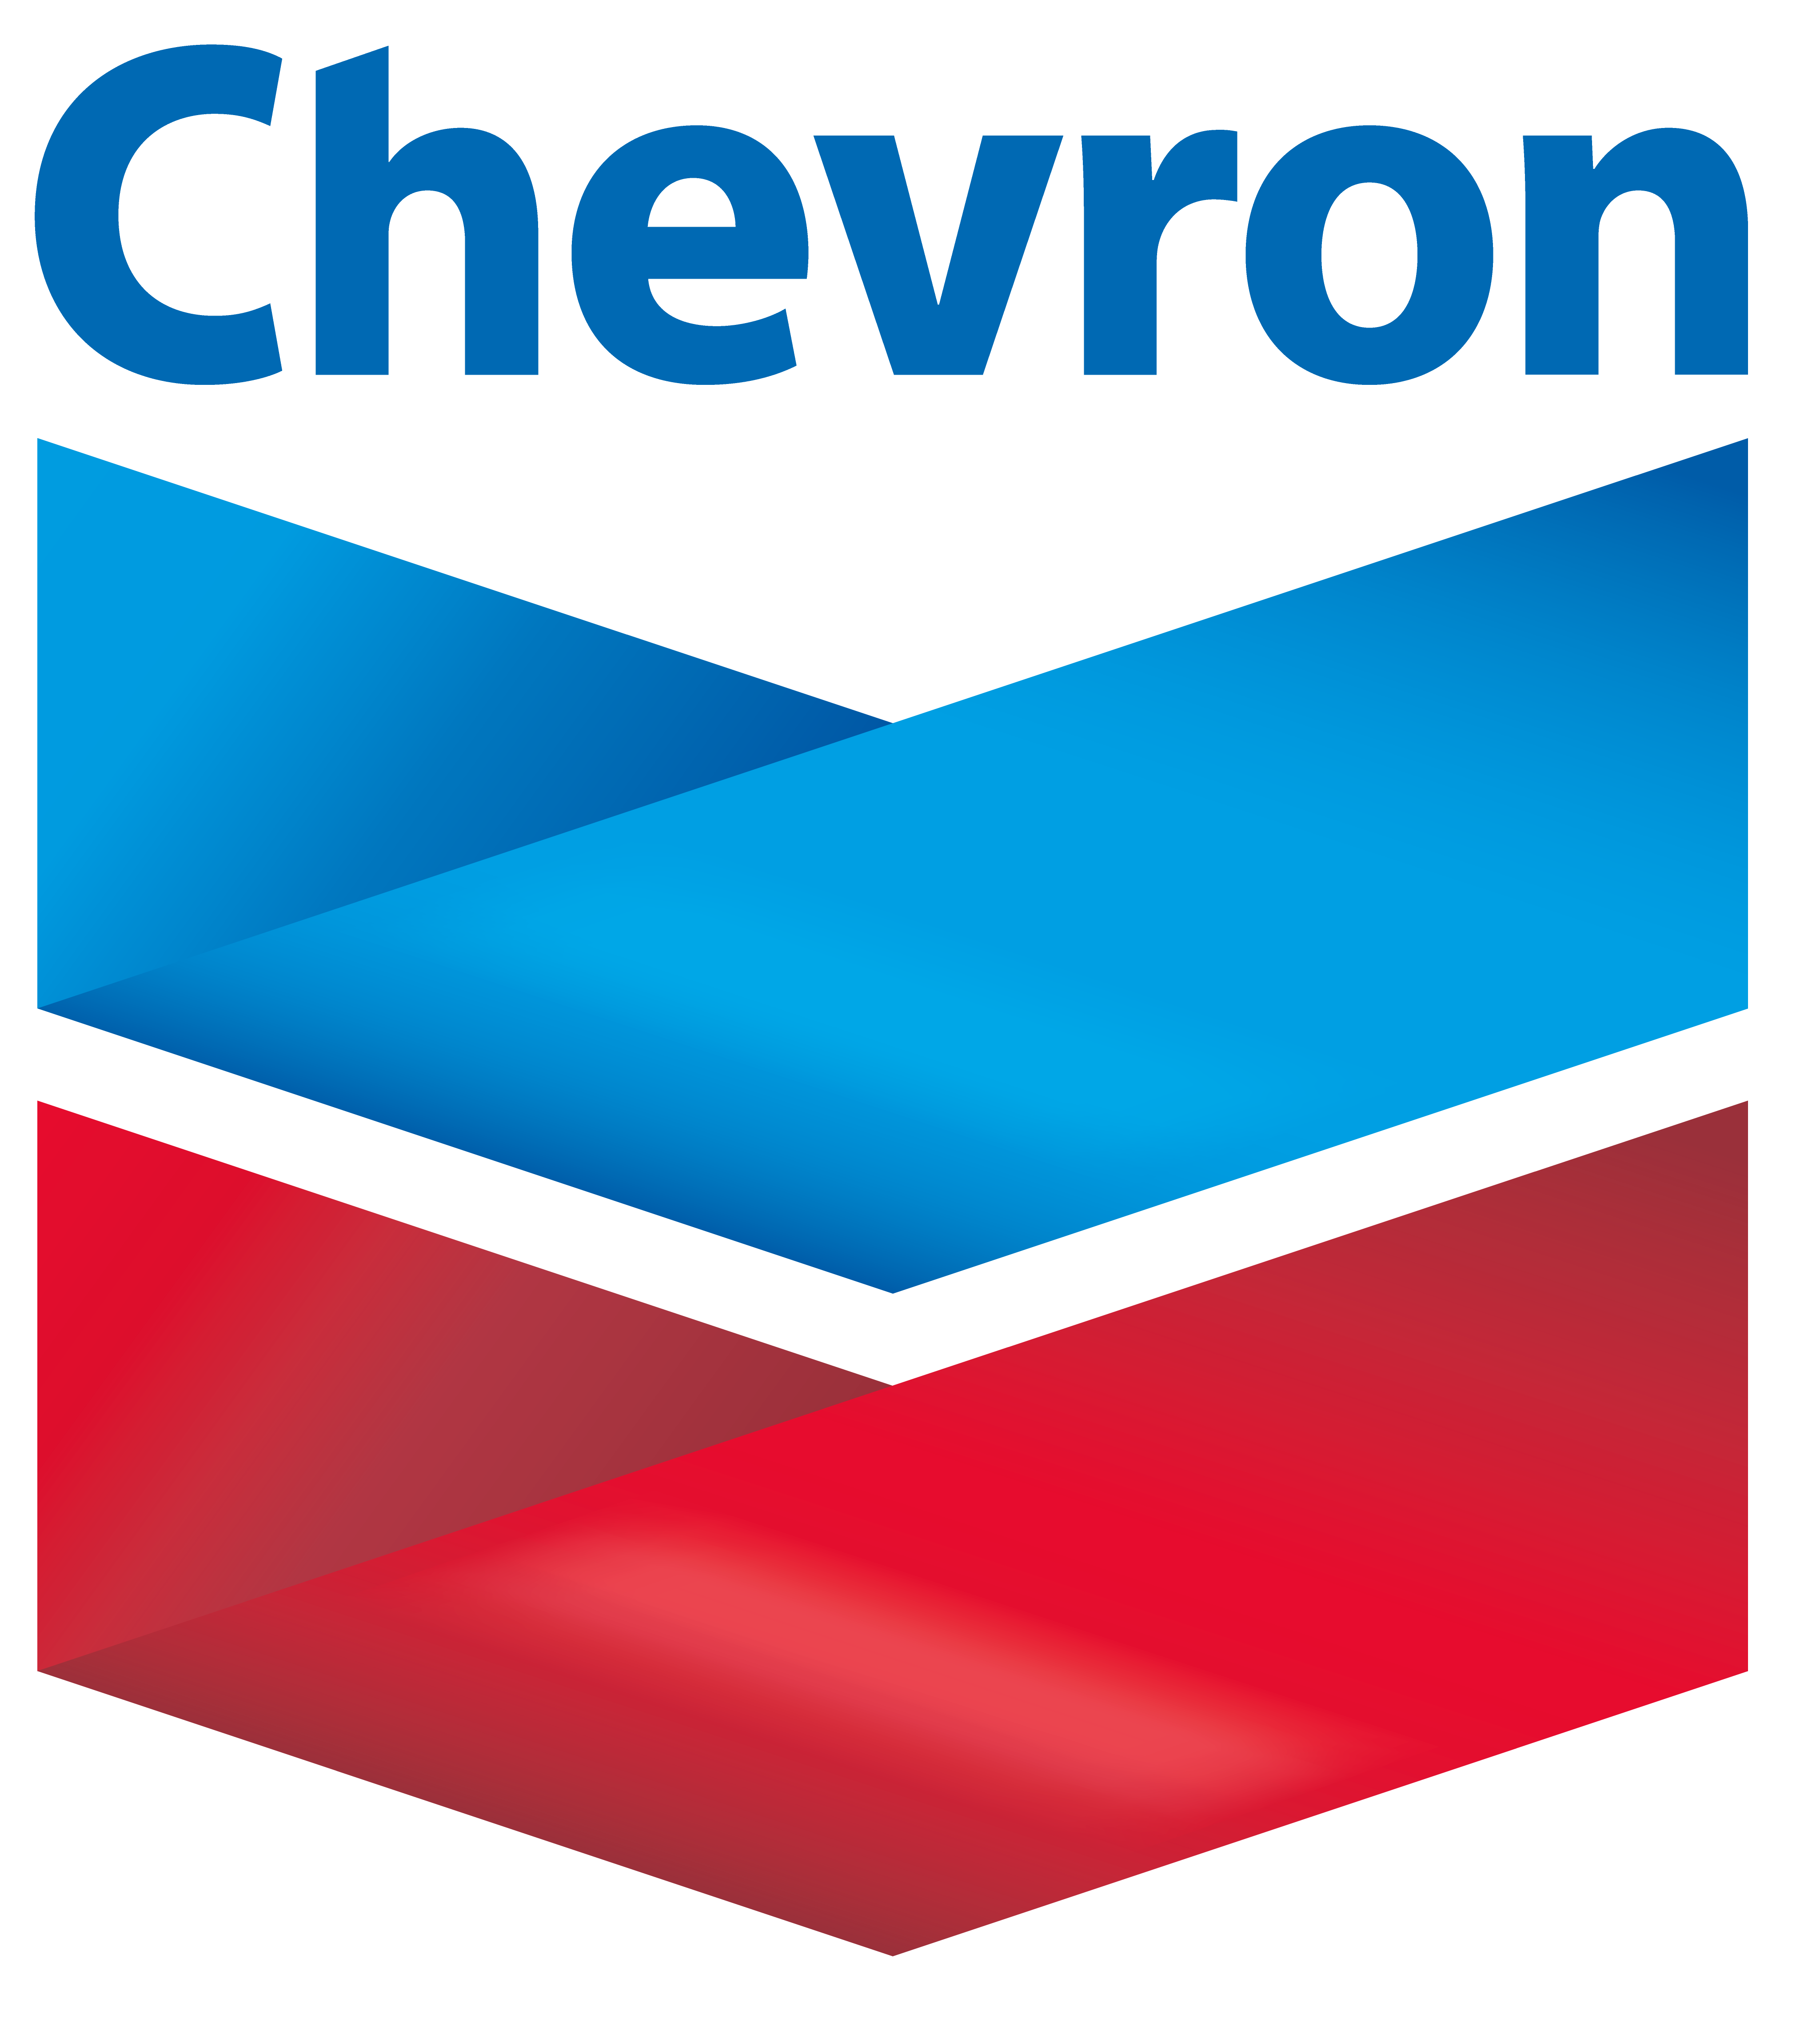 chevron logo - Chevron Logo